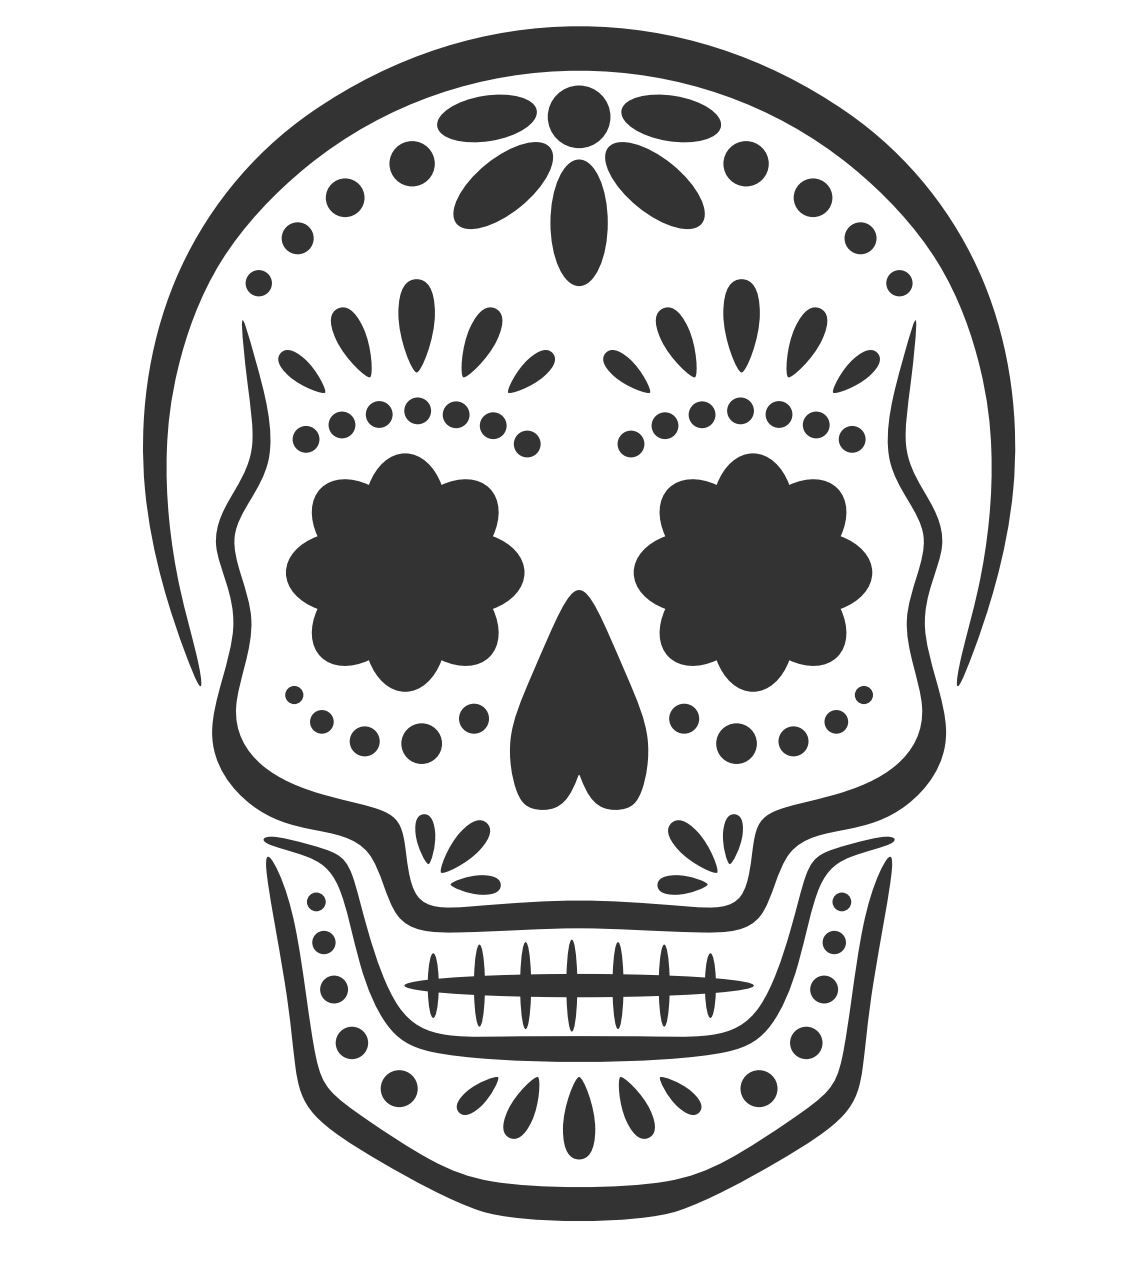 pumpkin template sugar skull  6 Free and Fabulous Halloween Pumpkin Stencils | Sugar ...